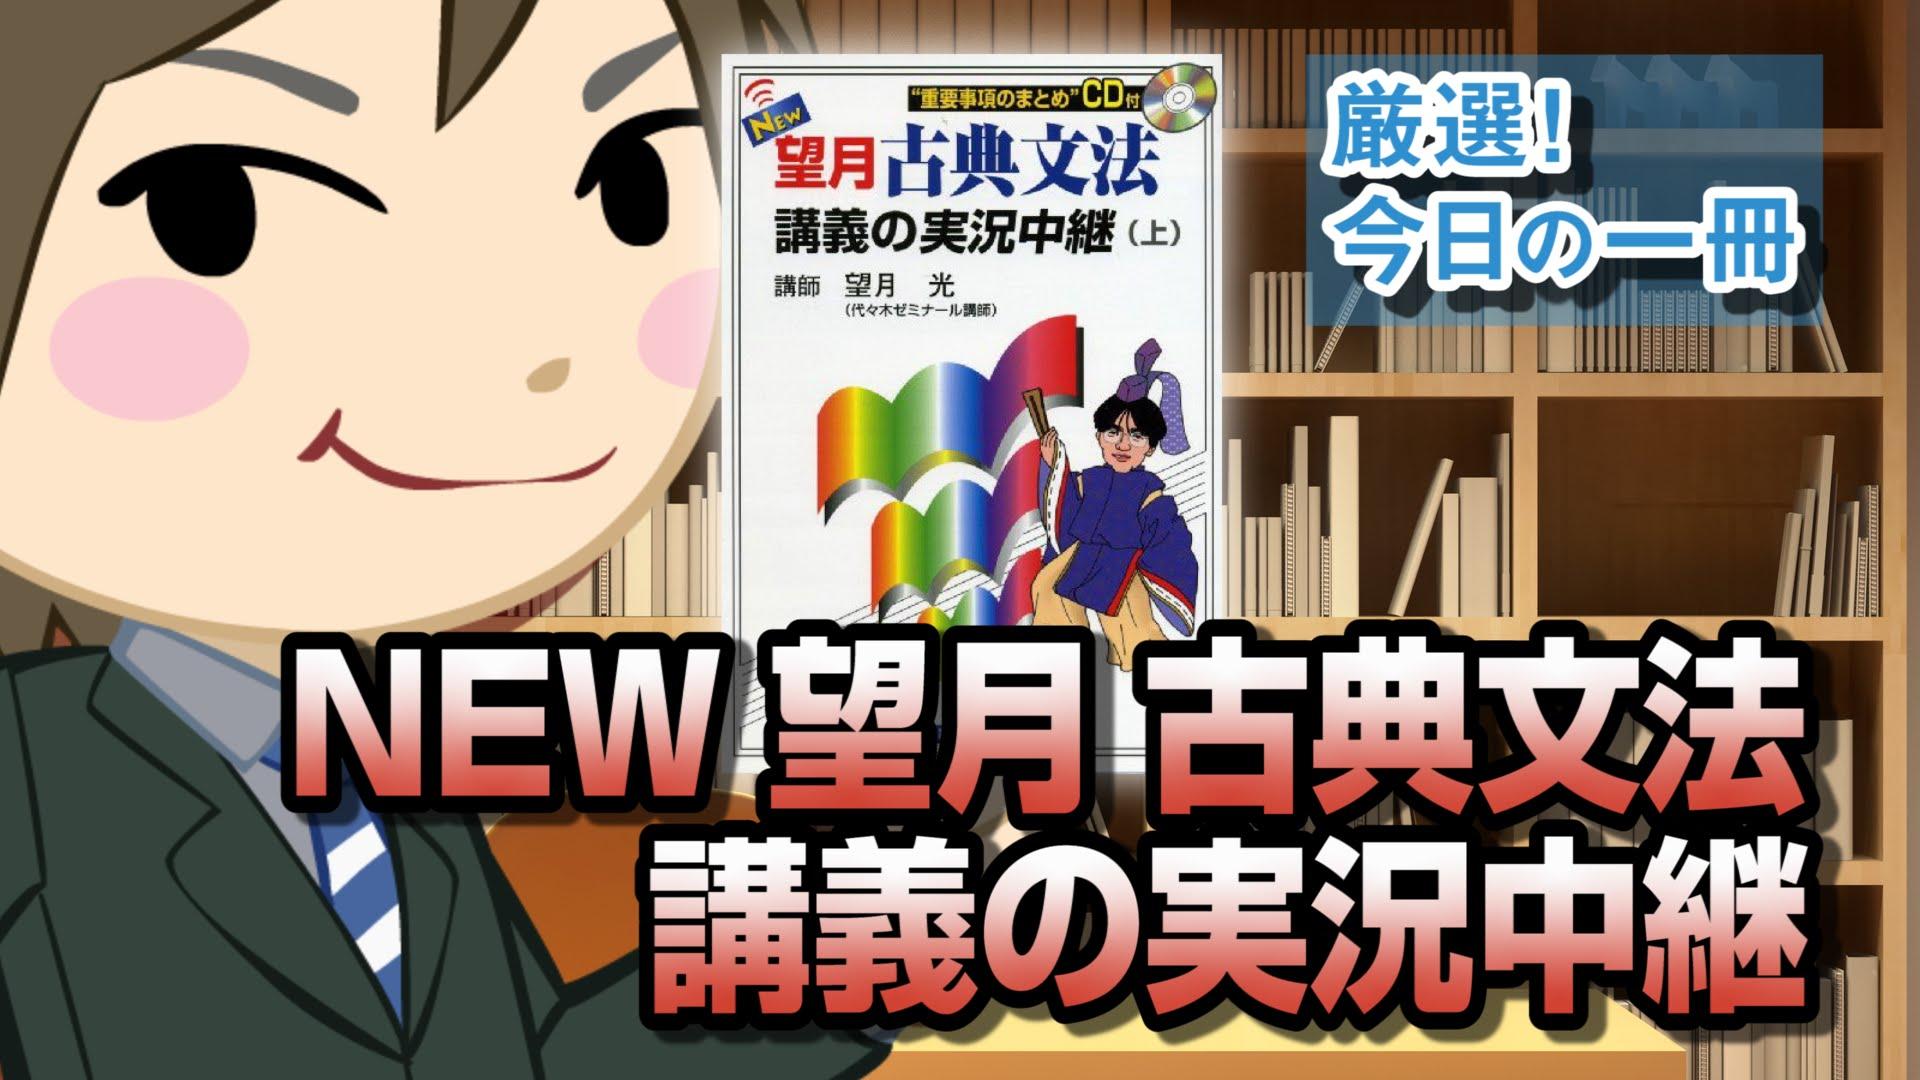 New望月古典文法講義の実況中継|武田塾厳選!今日の一冊